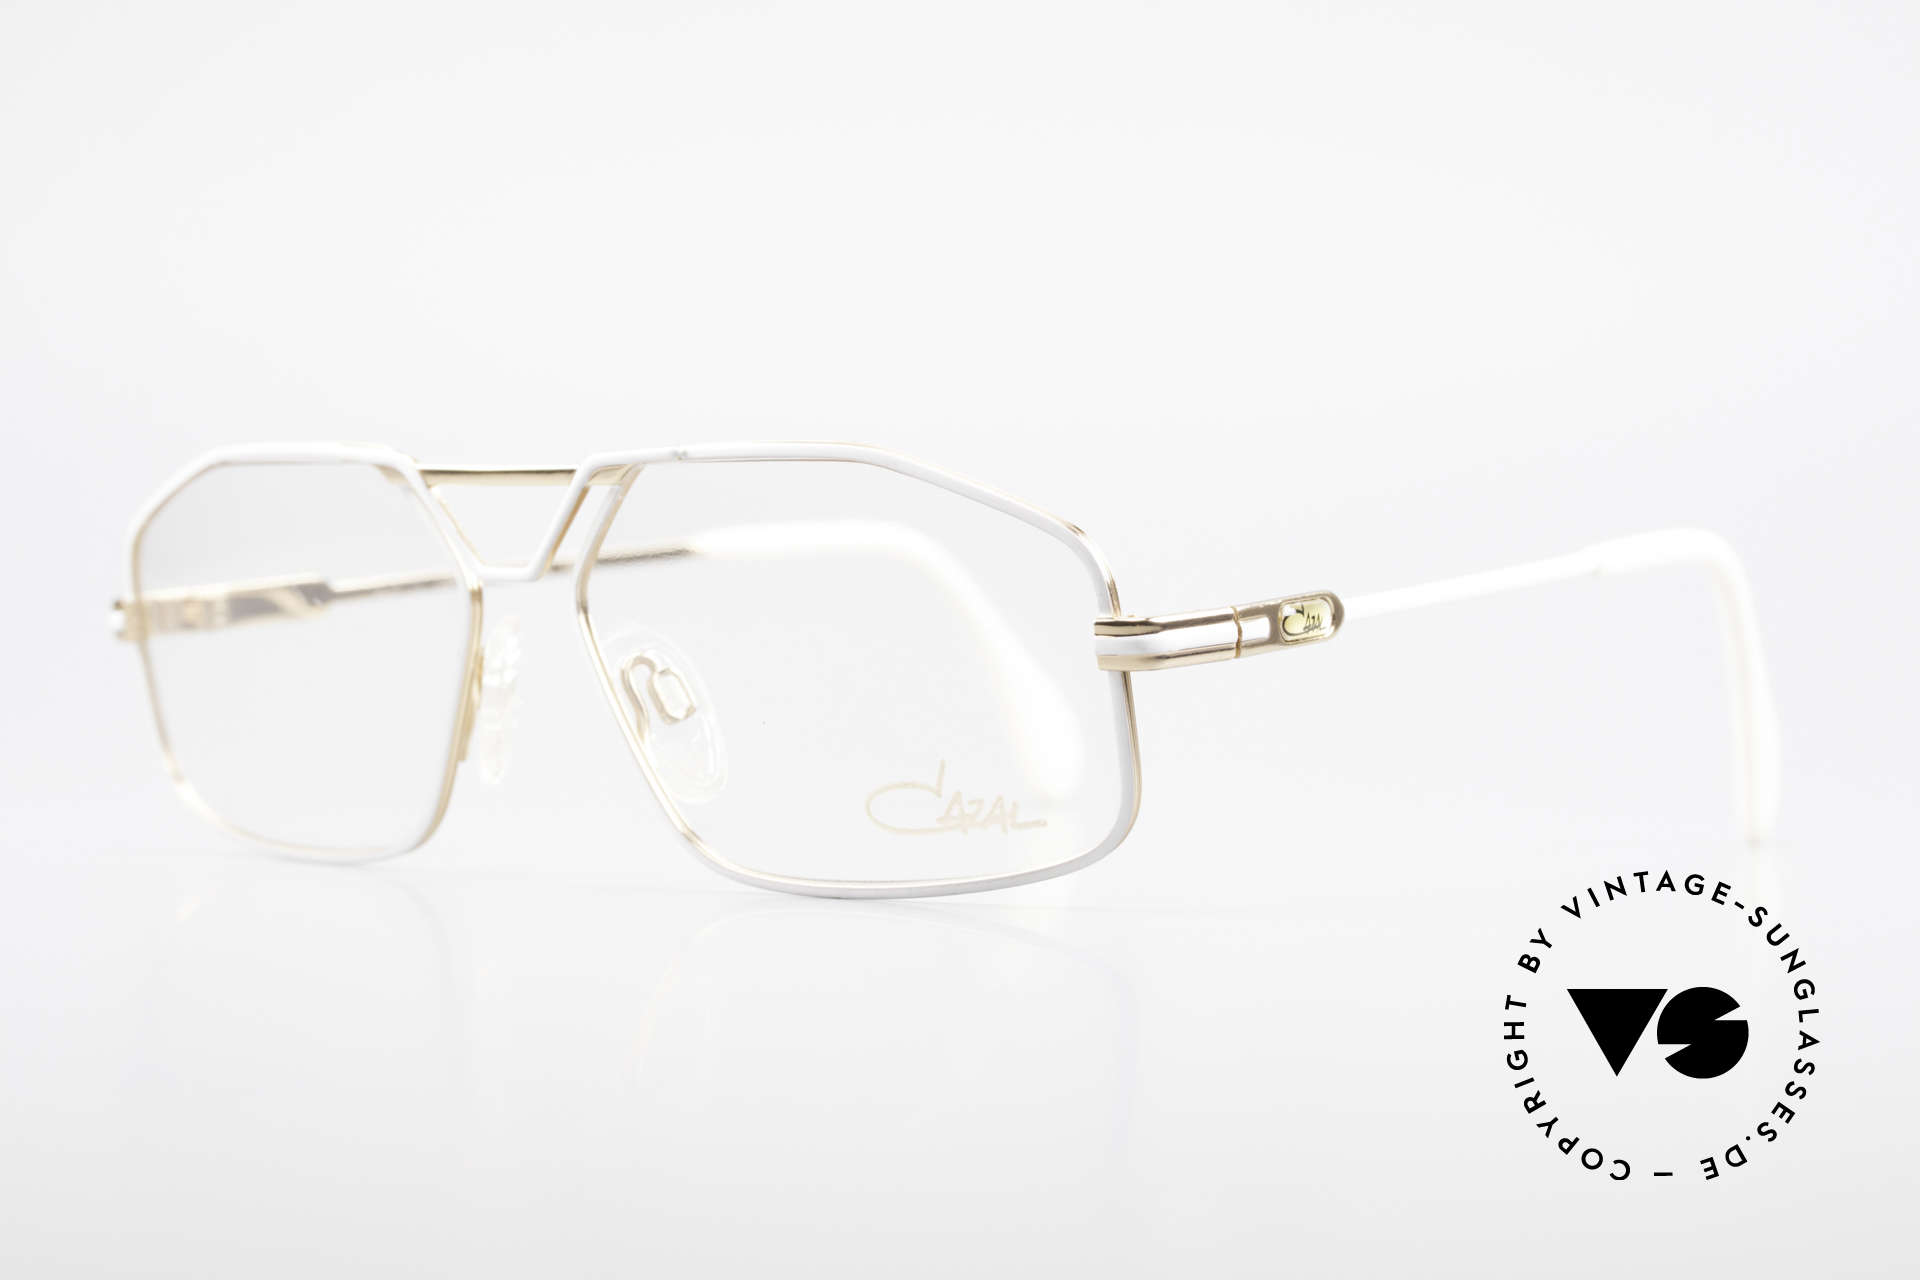 Cazal 729 Vintage Specs NO Retro Frame, it's the smaller version of the legendary CAZAL 735, Made for Men